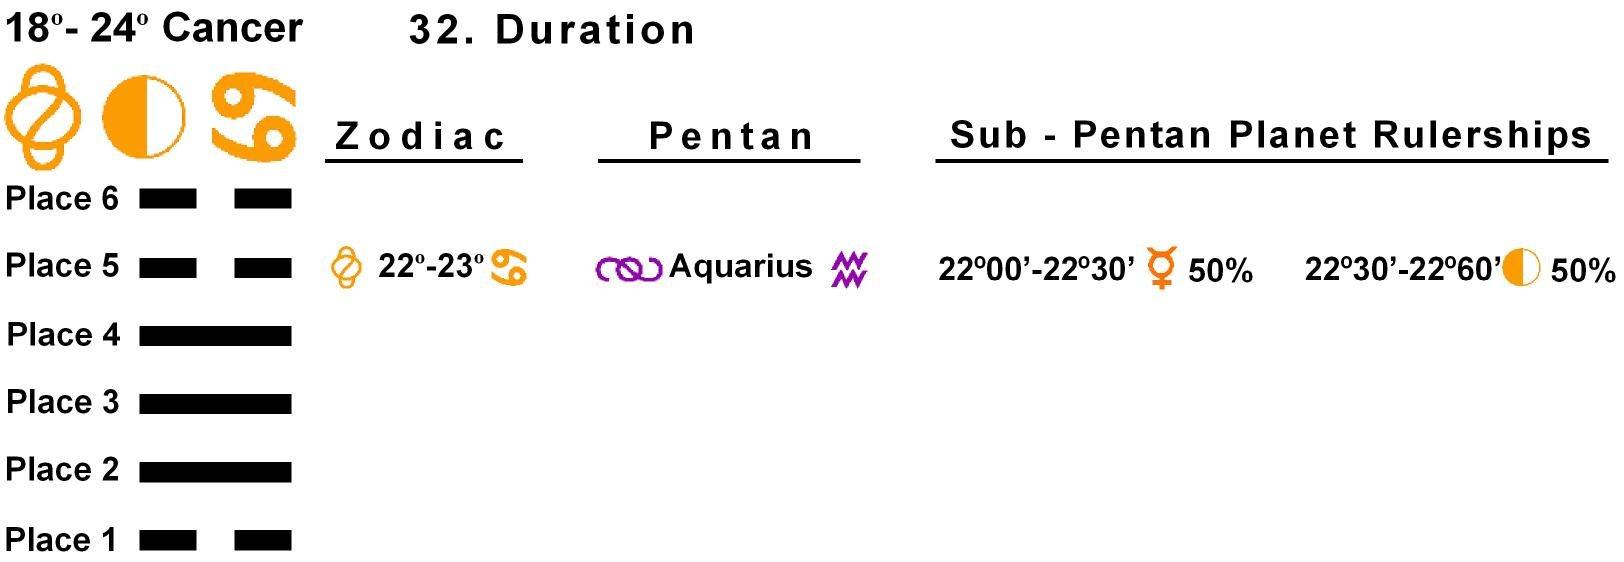 Pent-lines-04CA 22-23 Hx-32 Duration